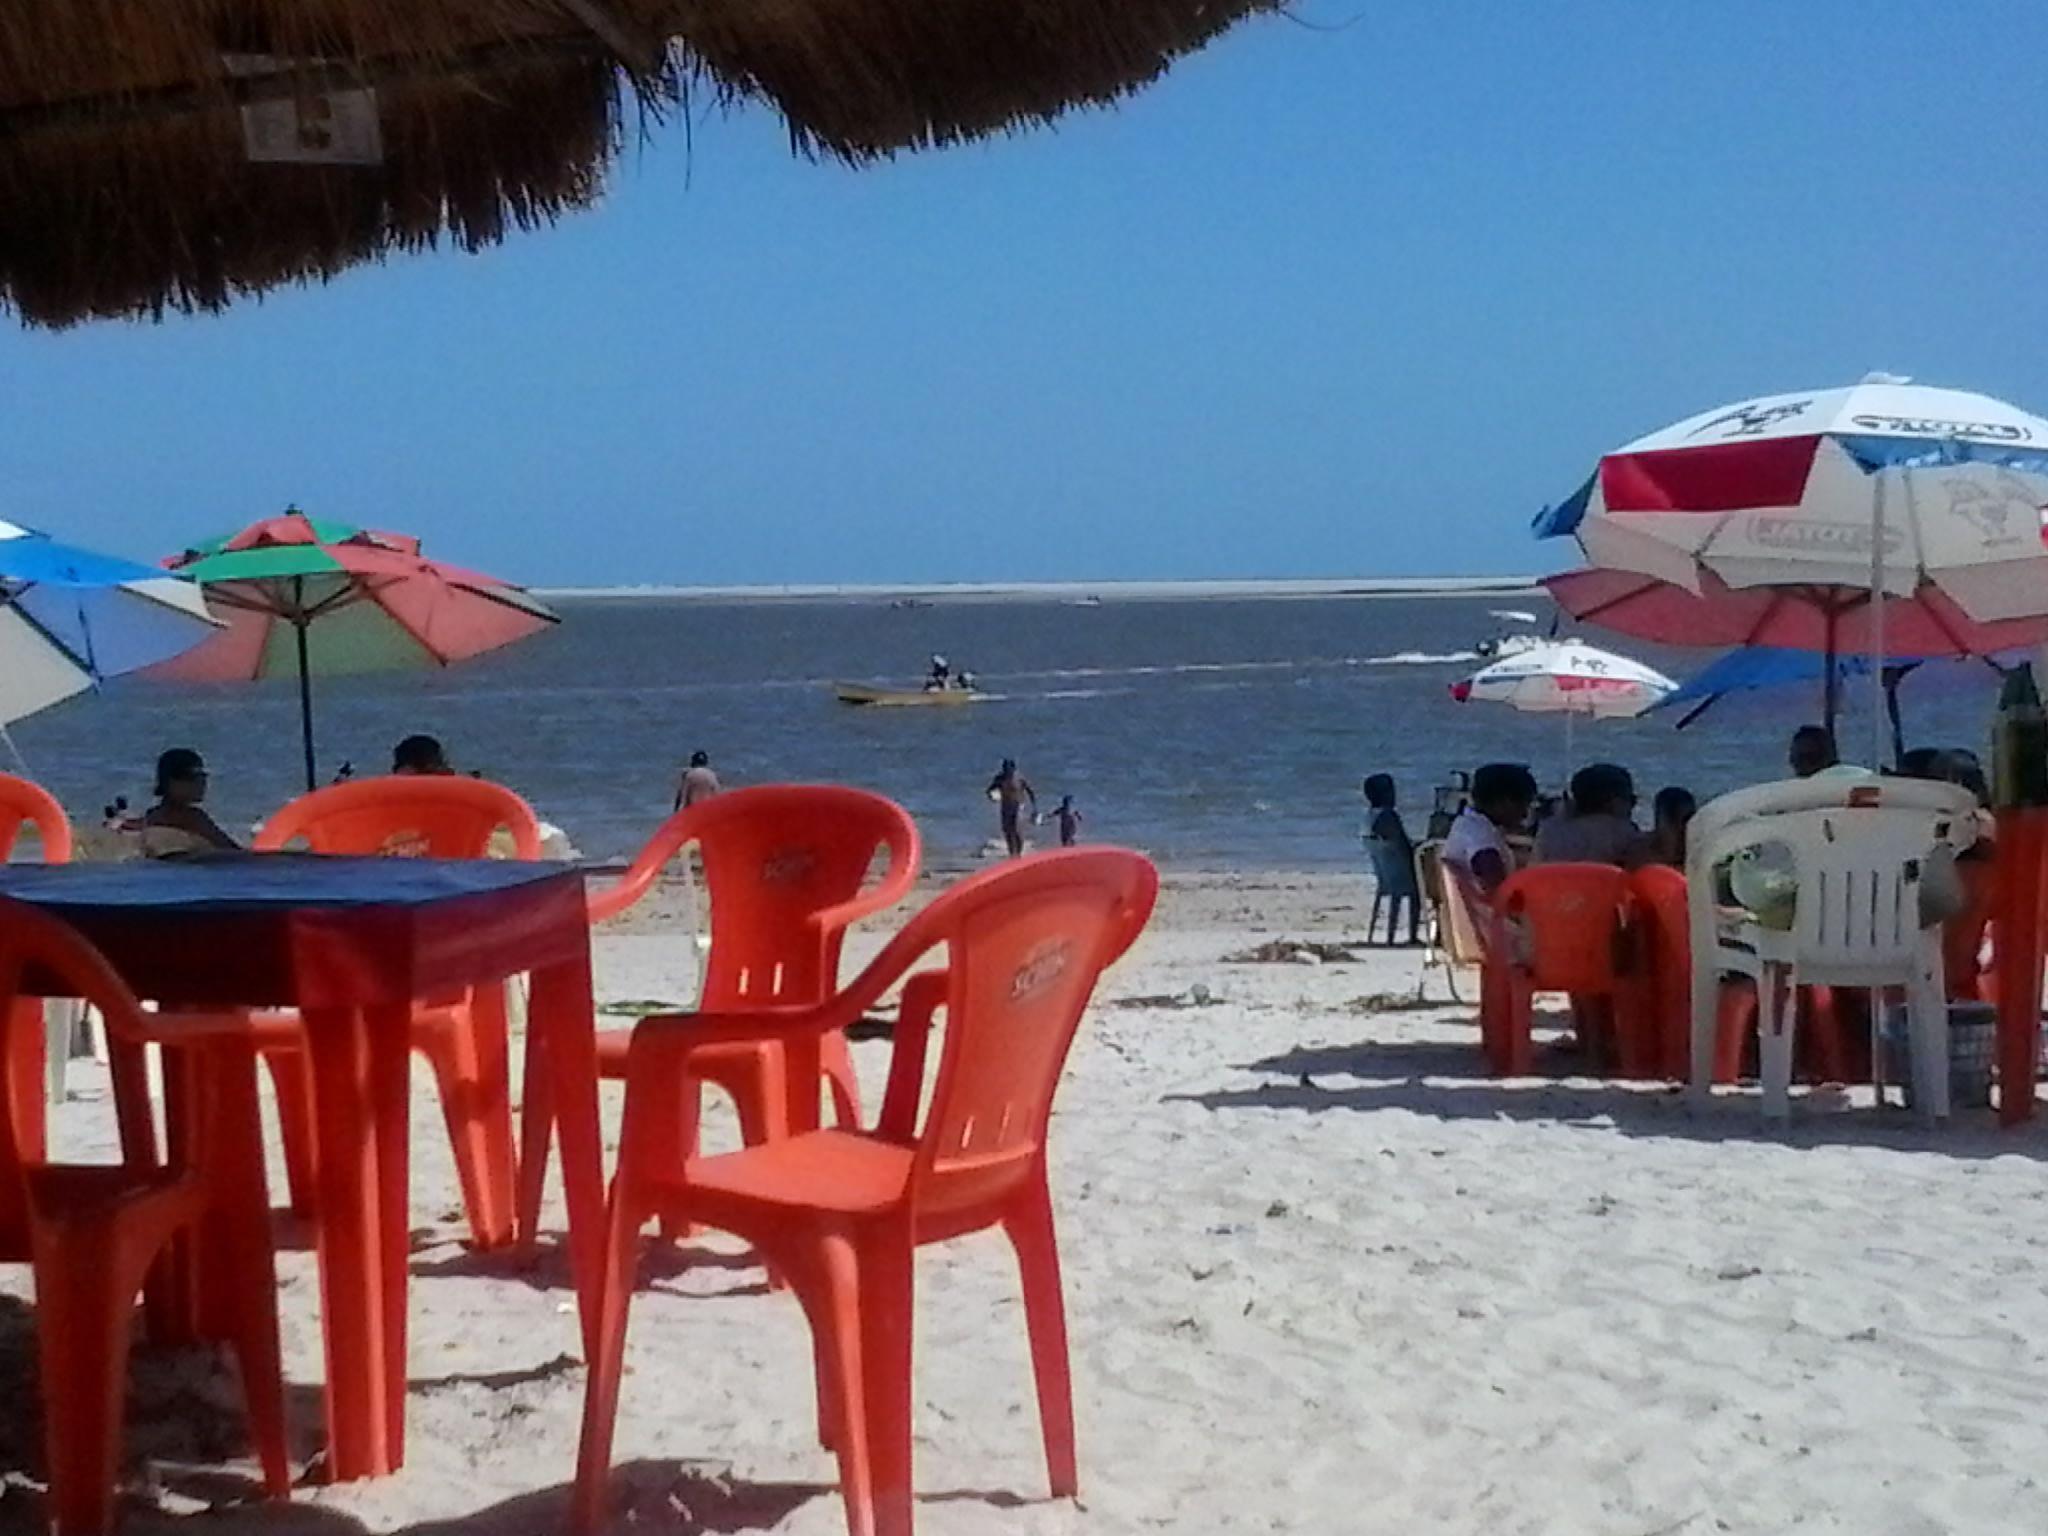 Praia do Forte - Ilha de Itamaracá - Pernambuco - Brasil